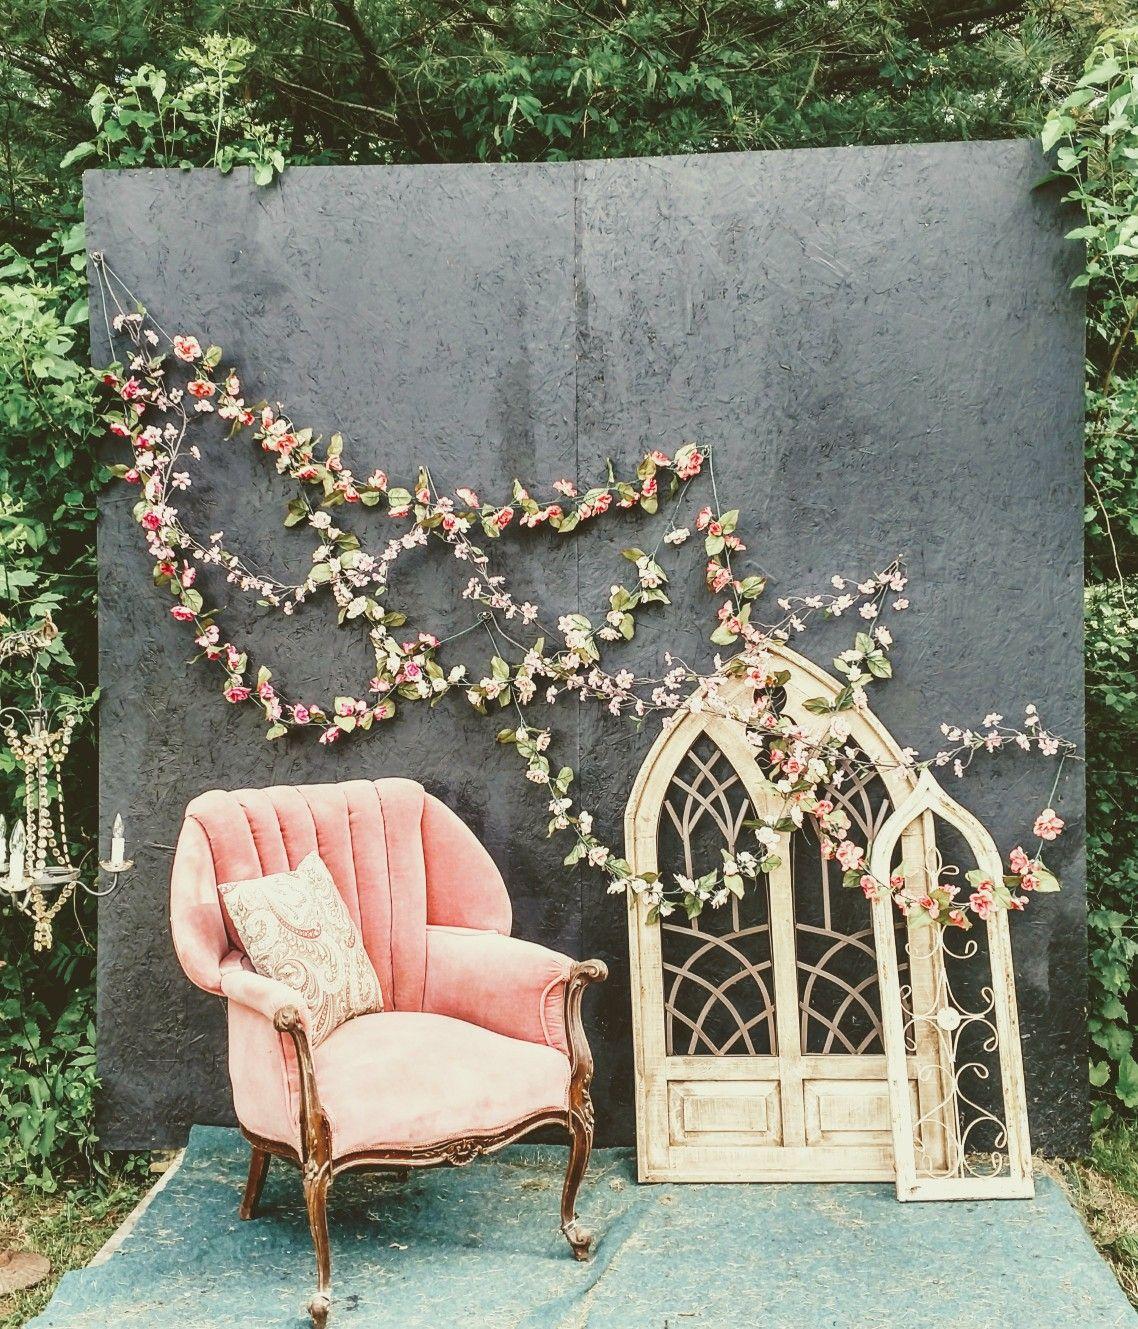 vintage wedding photo backdrop | Storybook gardens, Photo ...